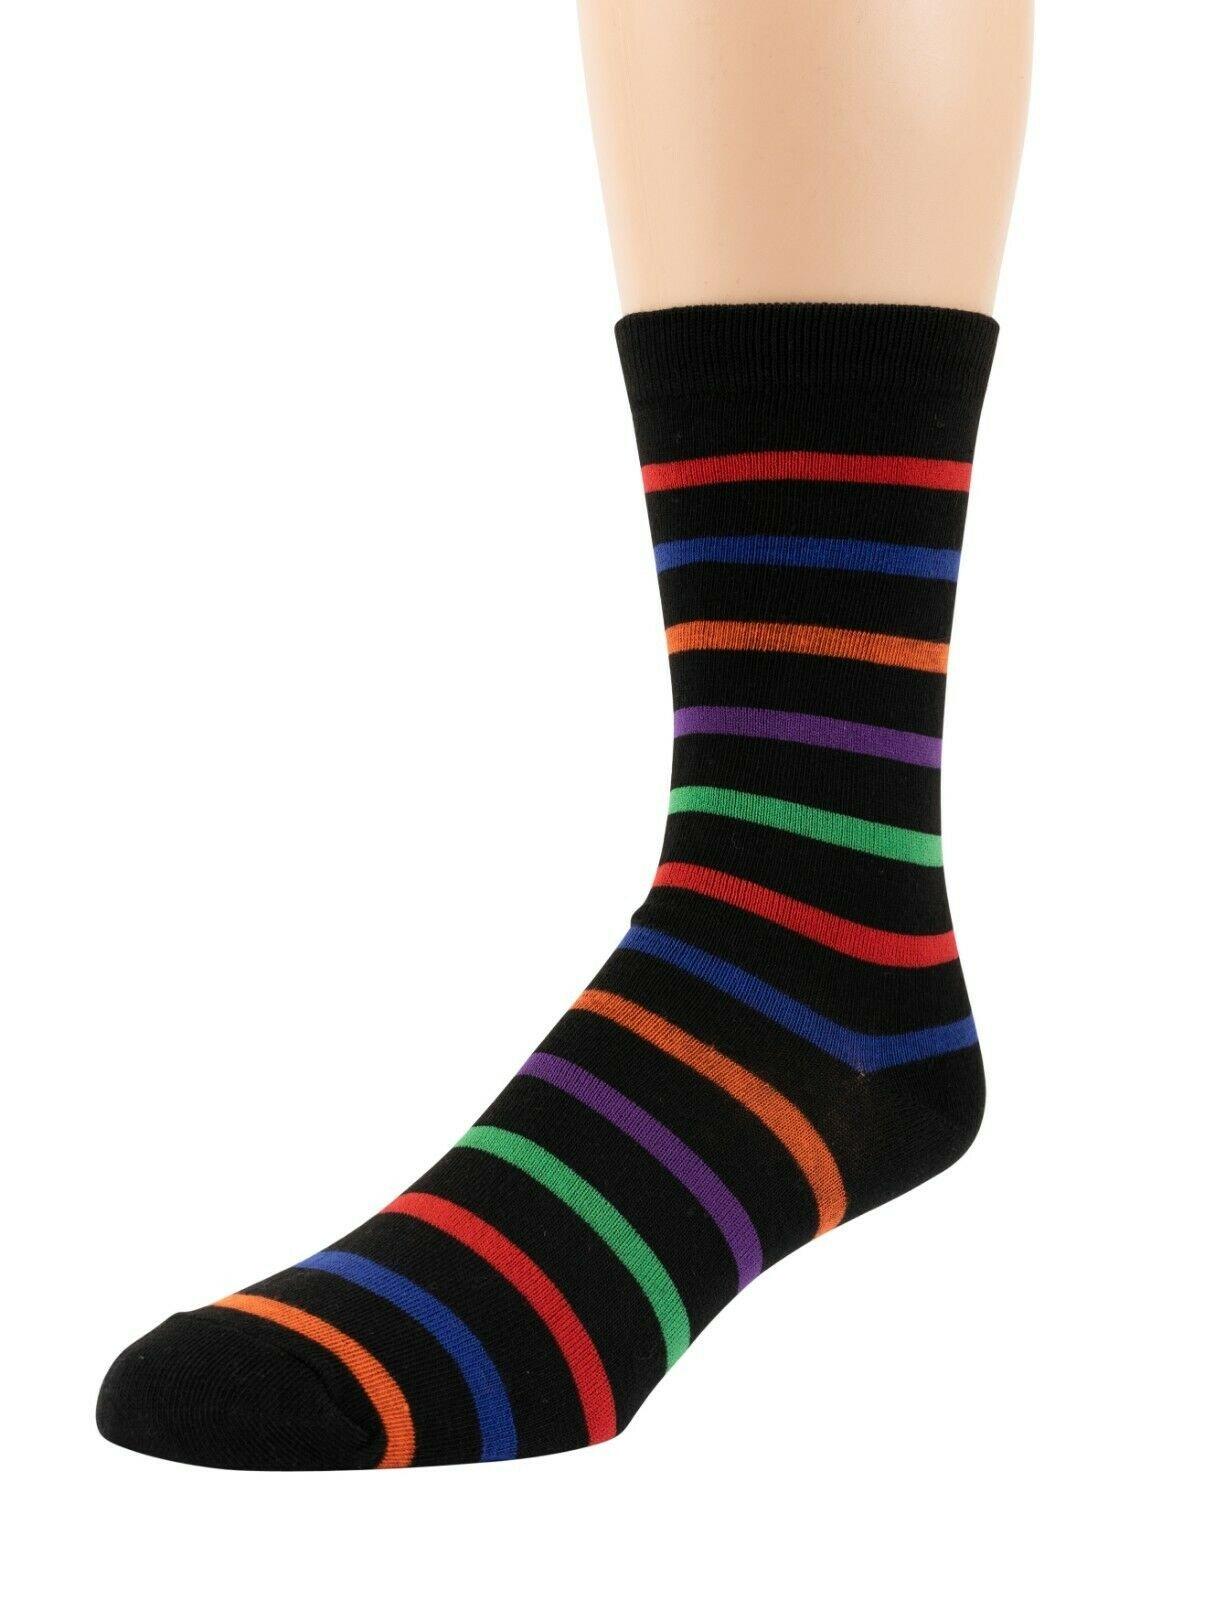 Mitch-Bogen-Mens-Cotton-Dress-Socks-Colorful-Fashion-Crew-Socks-8-Pack-Gift-Box thumbnail 29